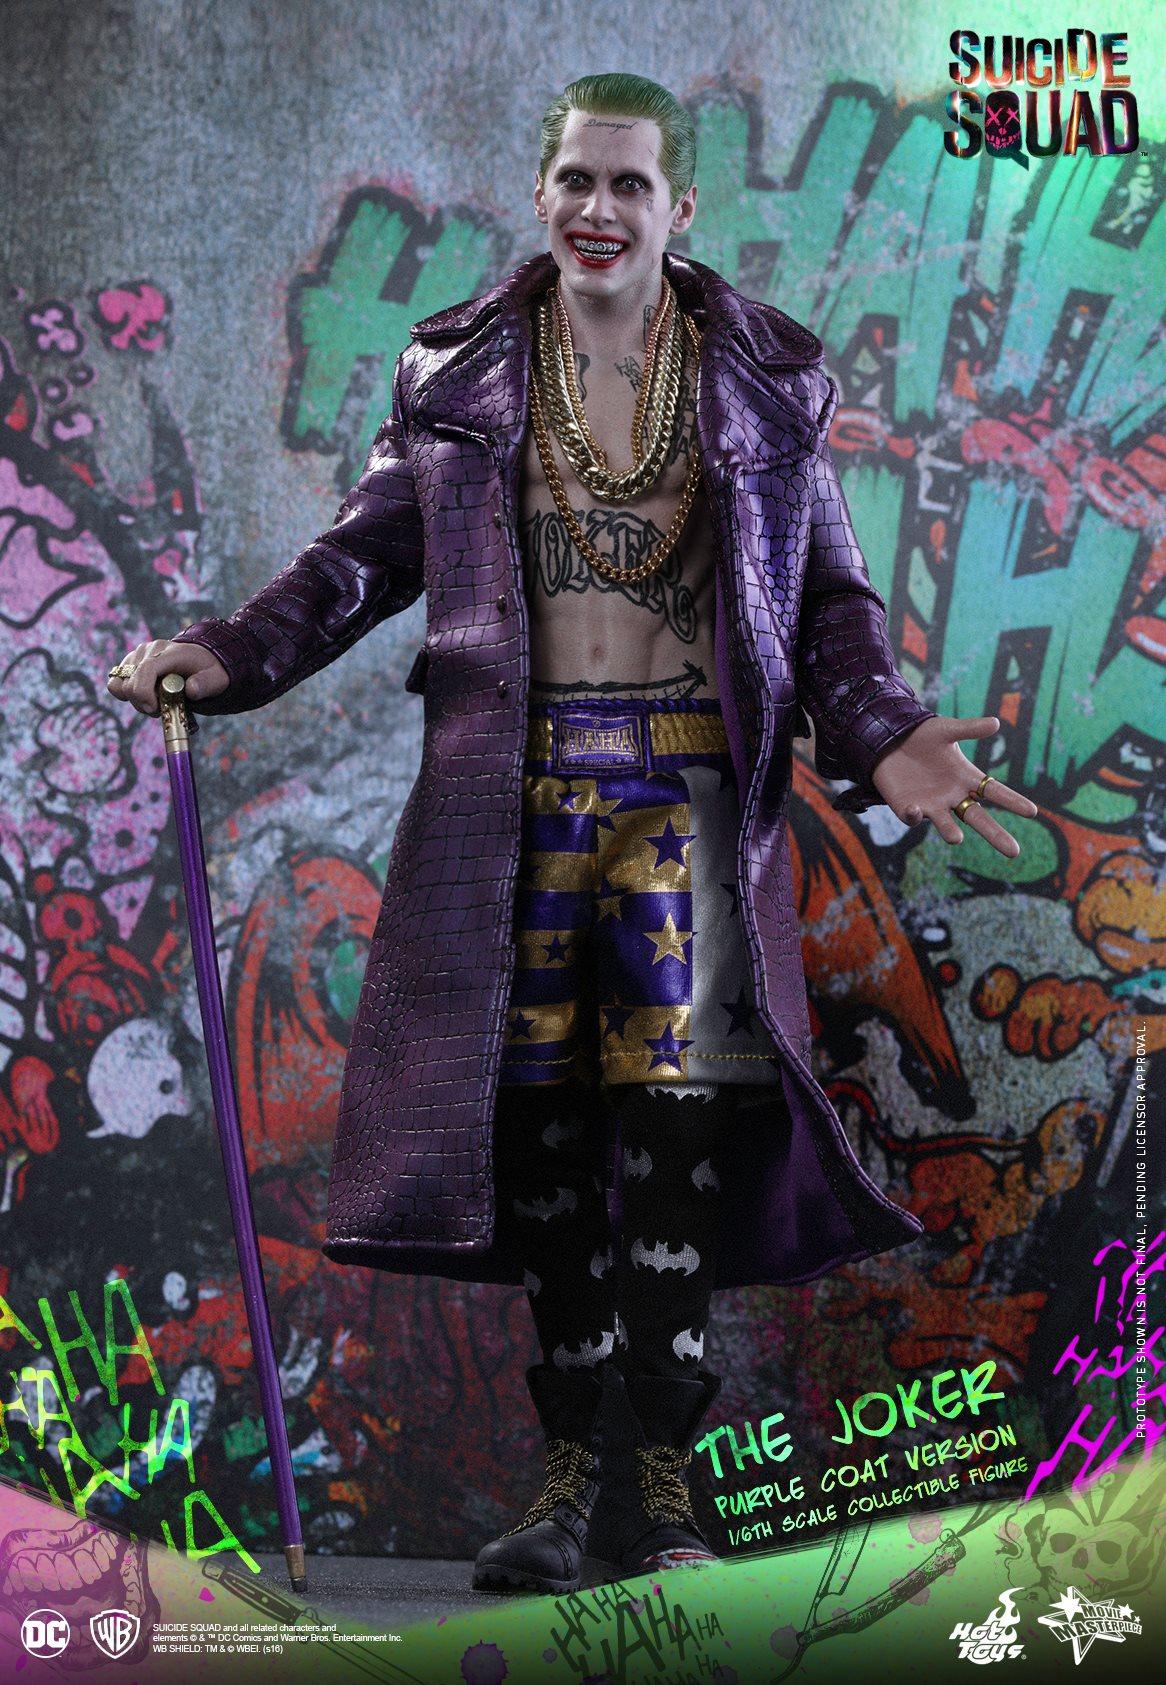 Hot-Toys-Suicide-Squad-Joker-Purple-Coat-1